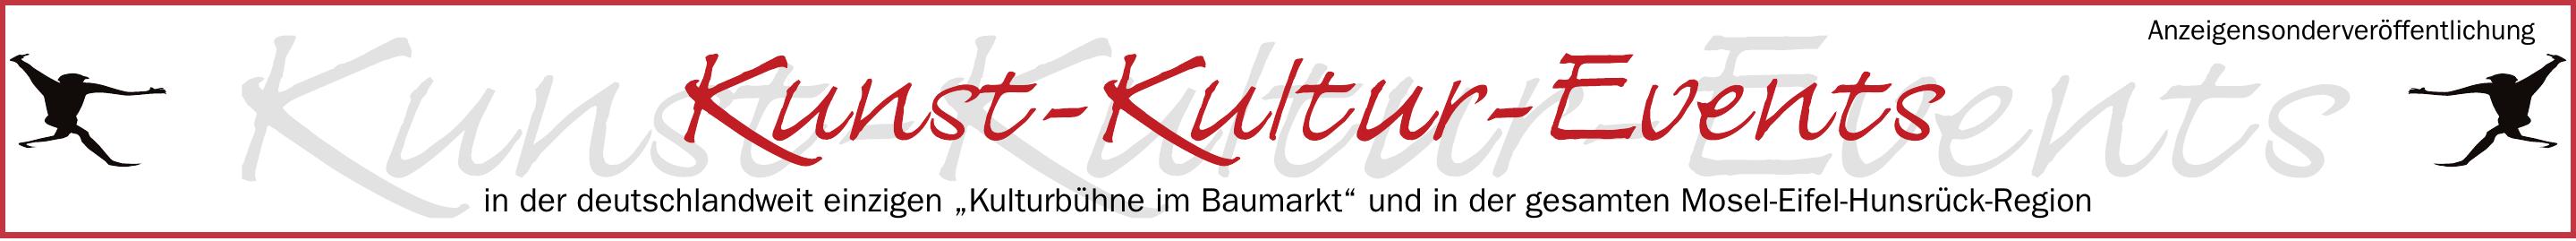 röhrig-Kulturbühne präsentiert in der Region virtuelle Comedy-Highlights Image 1